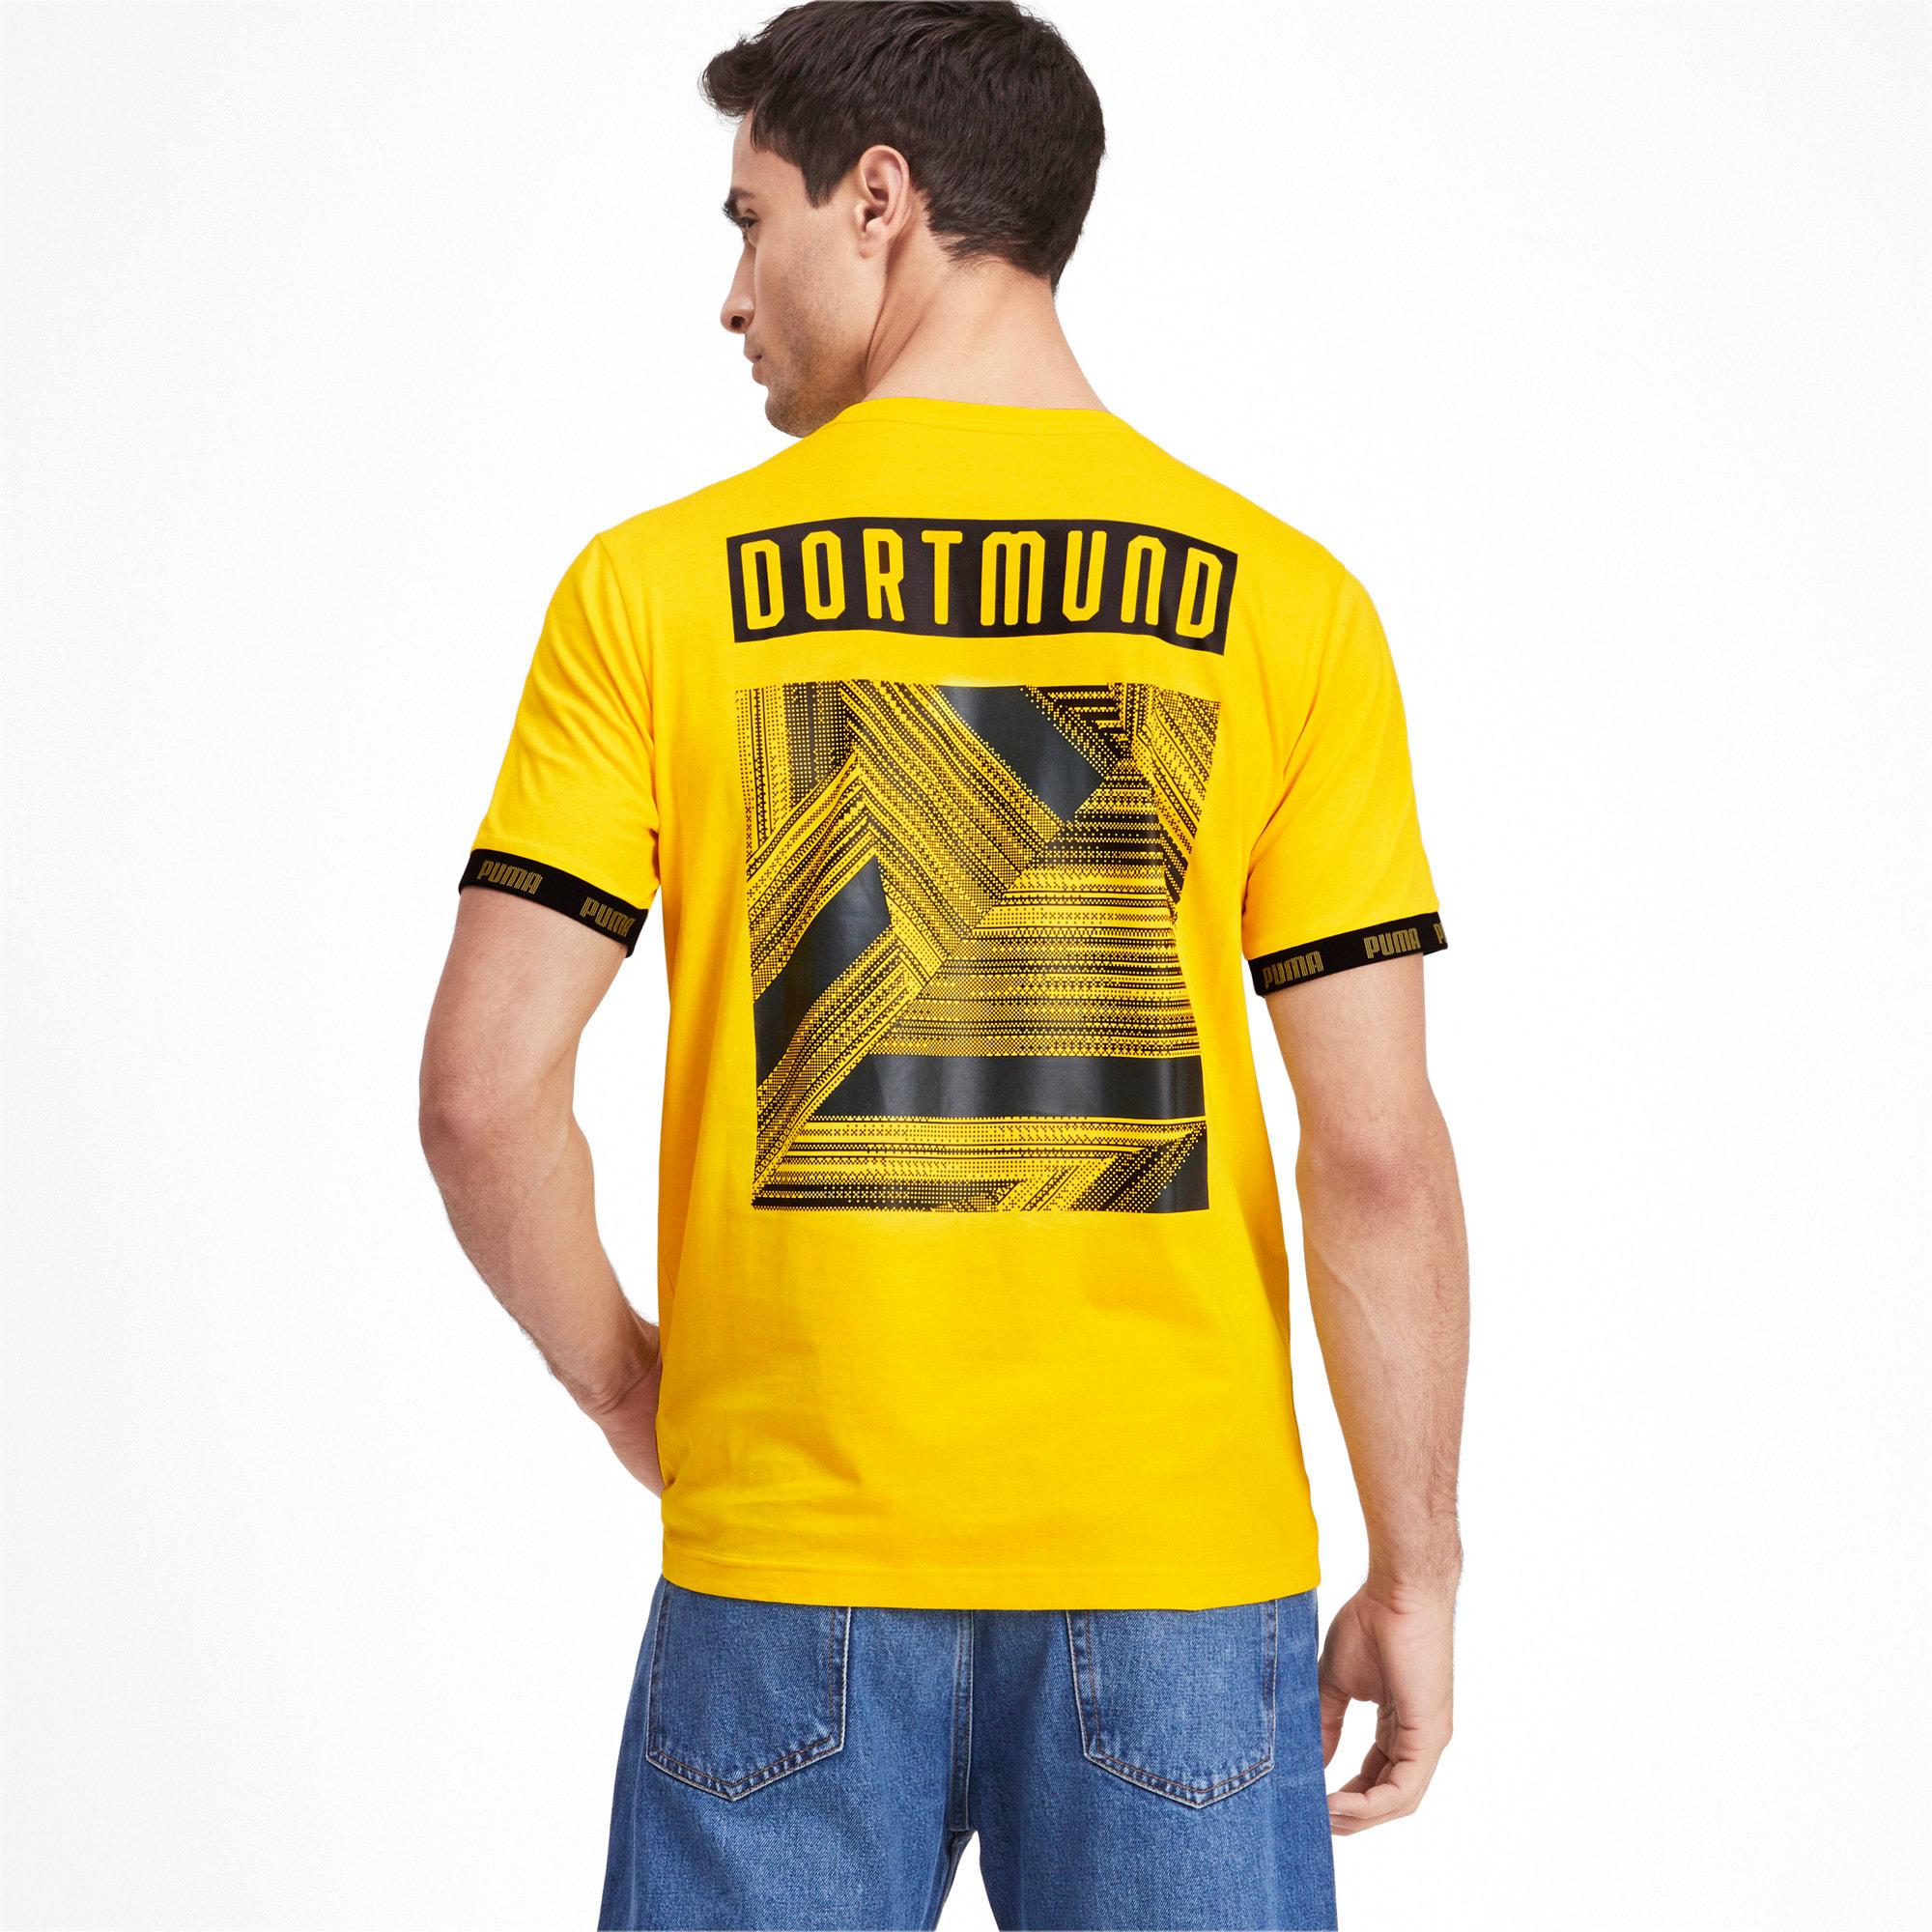 Thumbnail 2 of BVB Football Culture Men's Tee, Cyber Yellow, medium